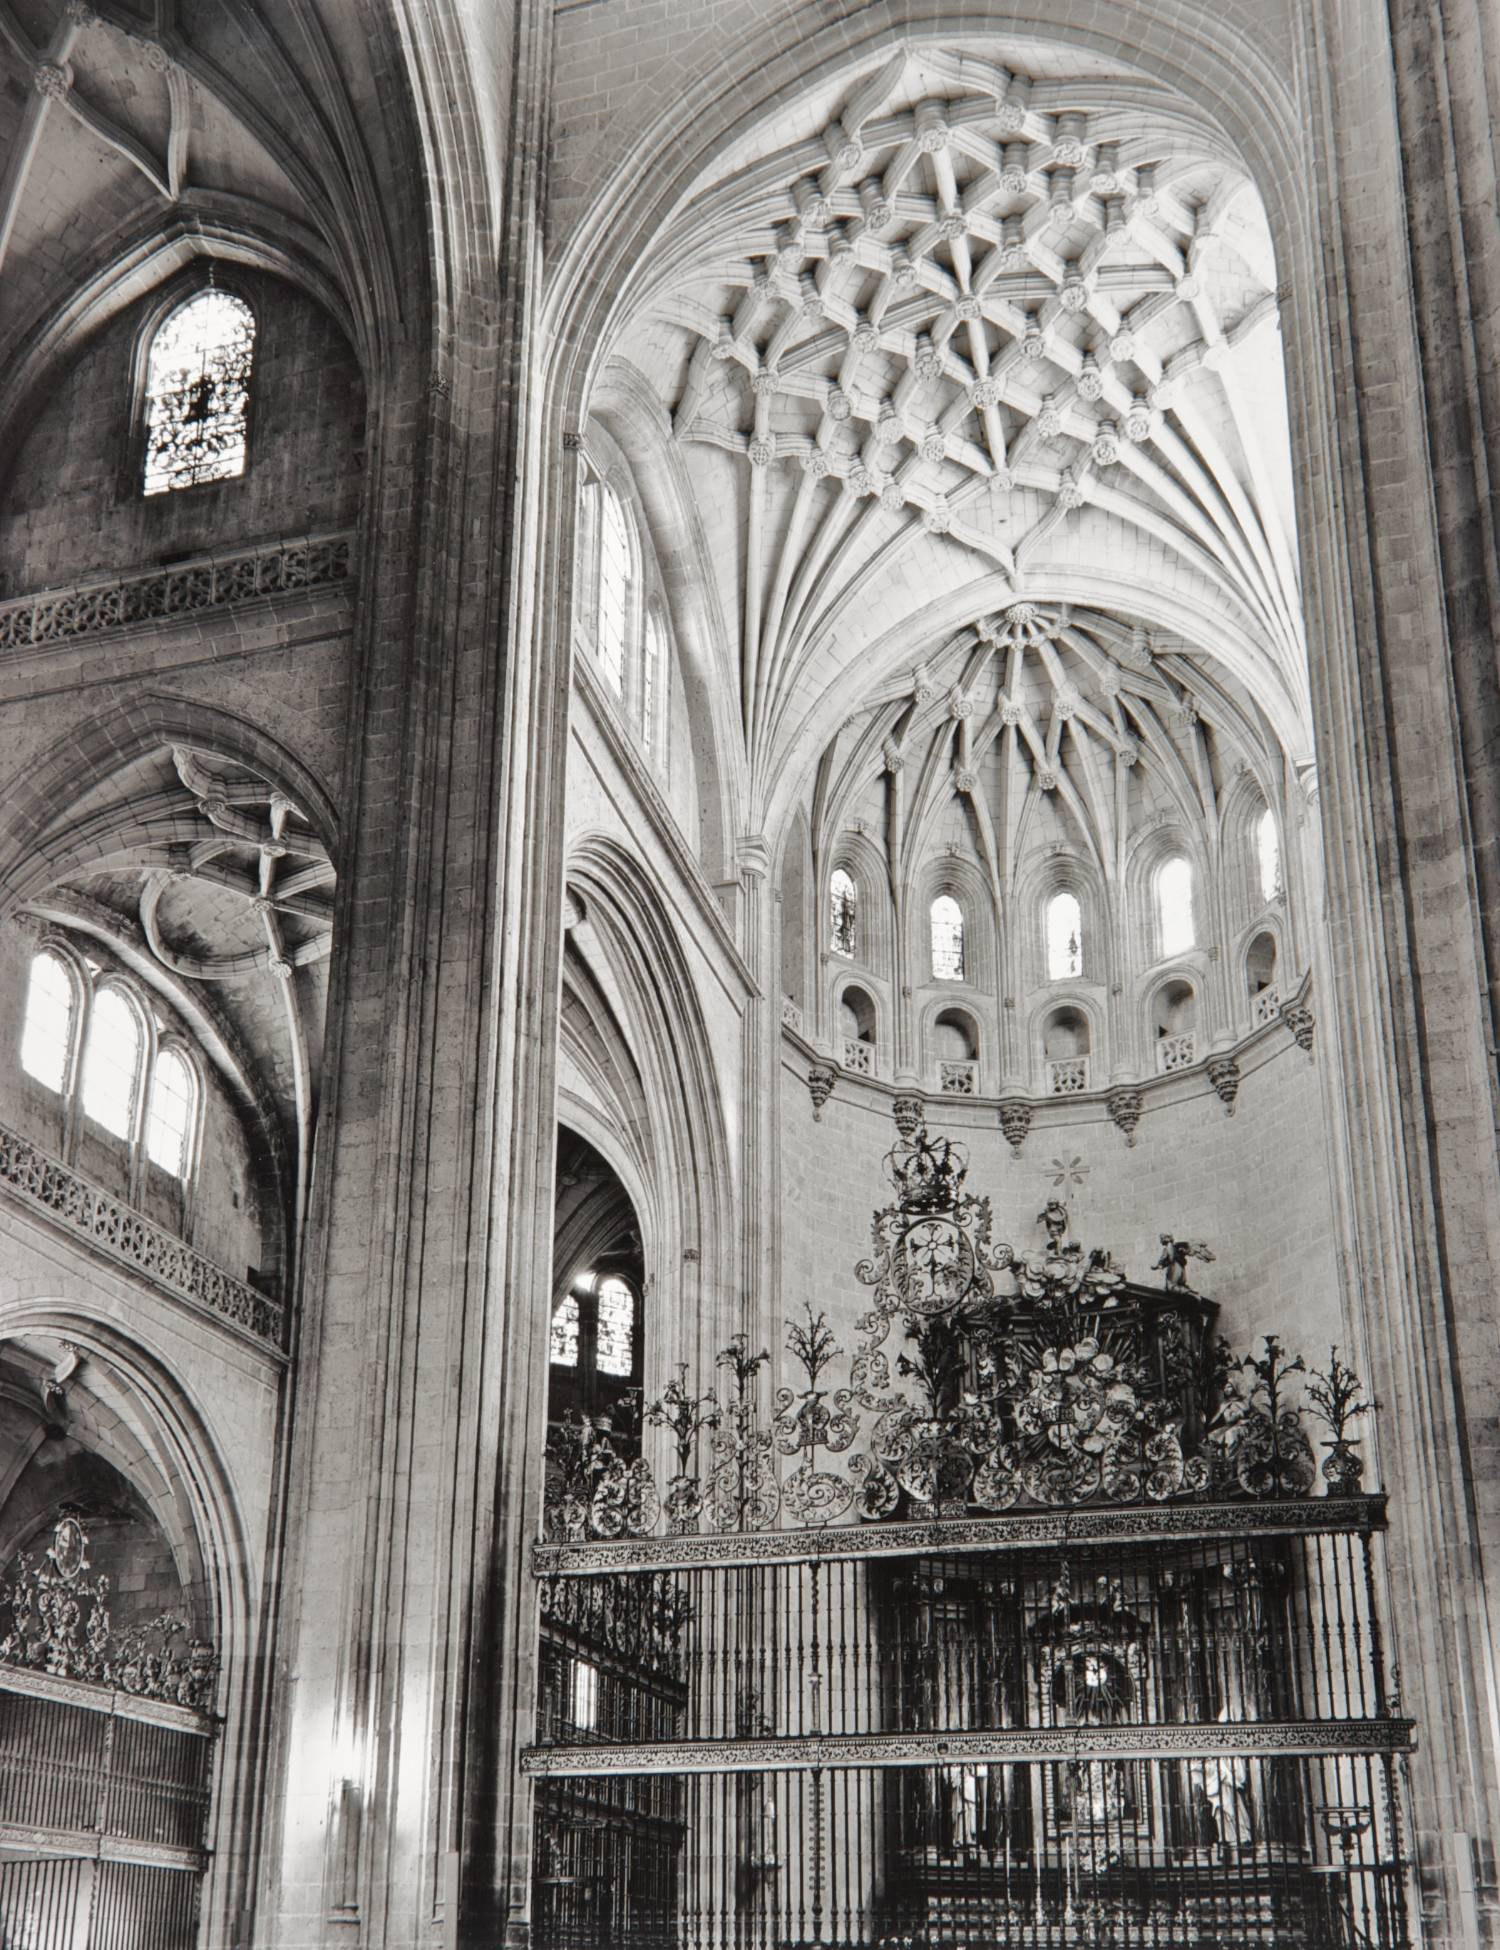 Segovia Cathedral (Spain)